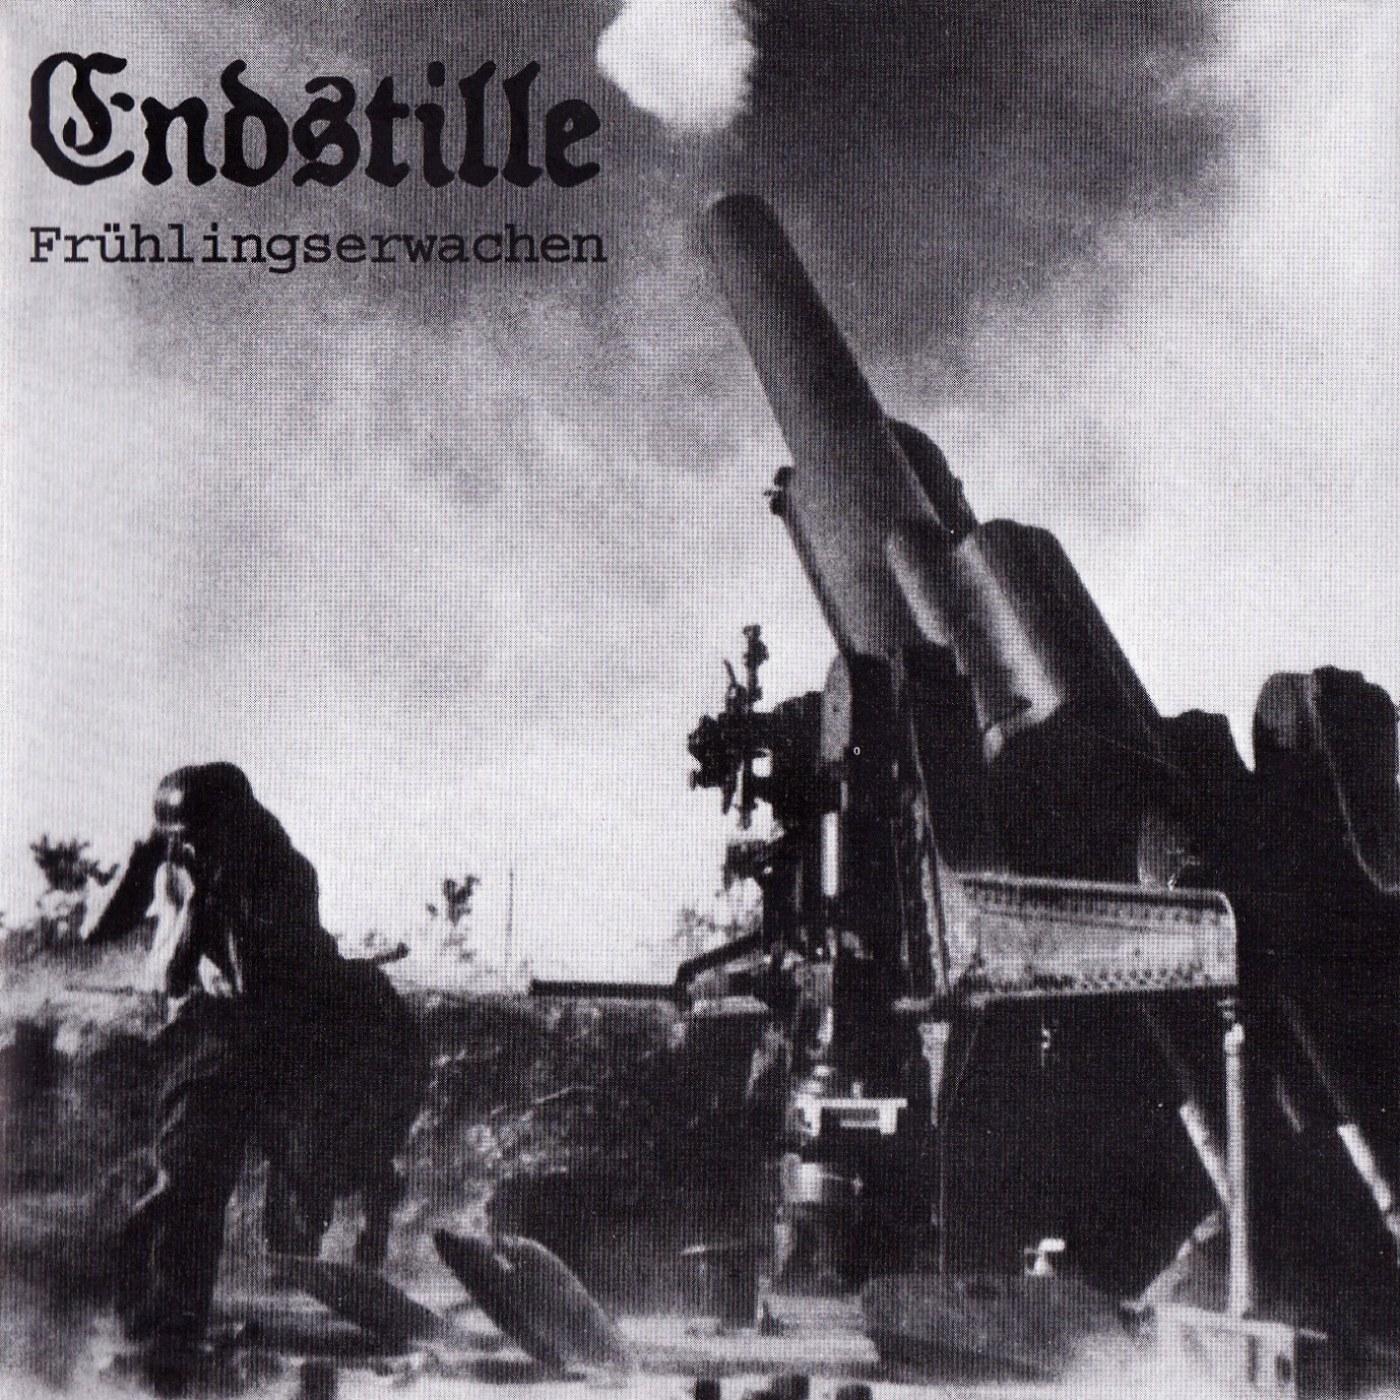 Review for Endstille - Frühlingserwachen